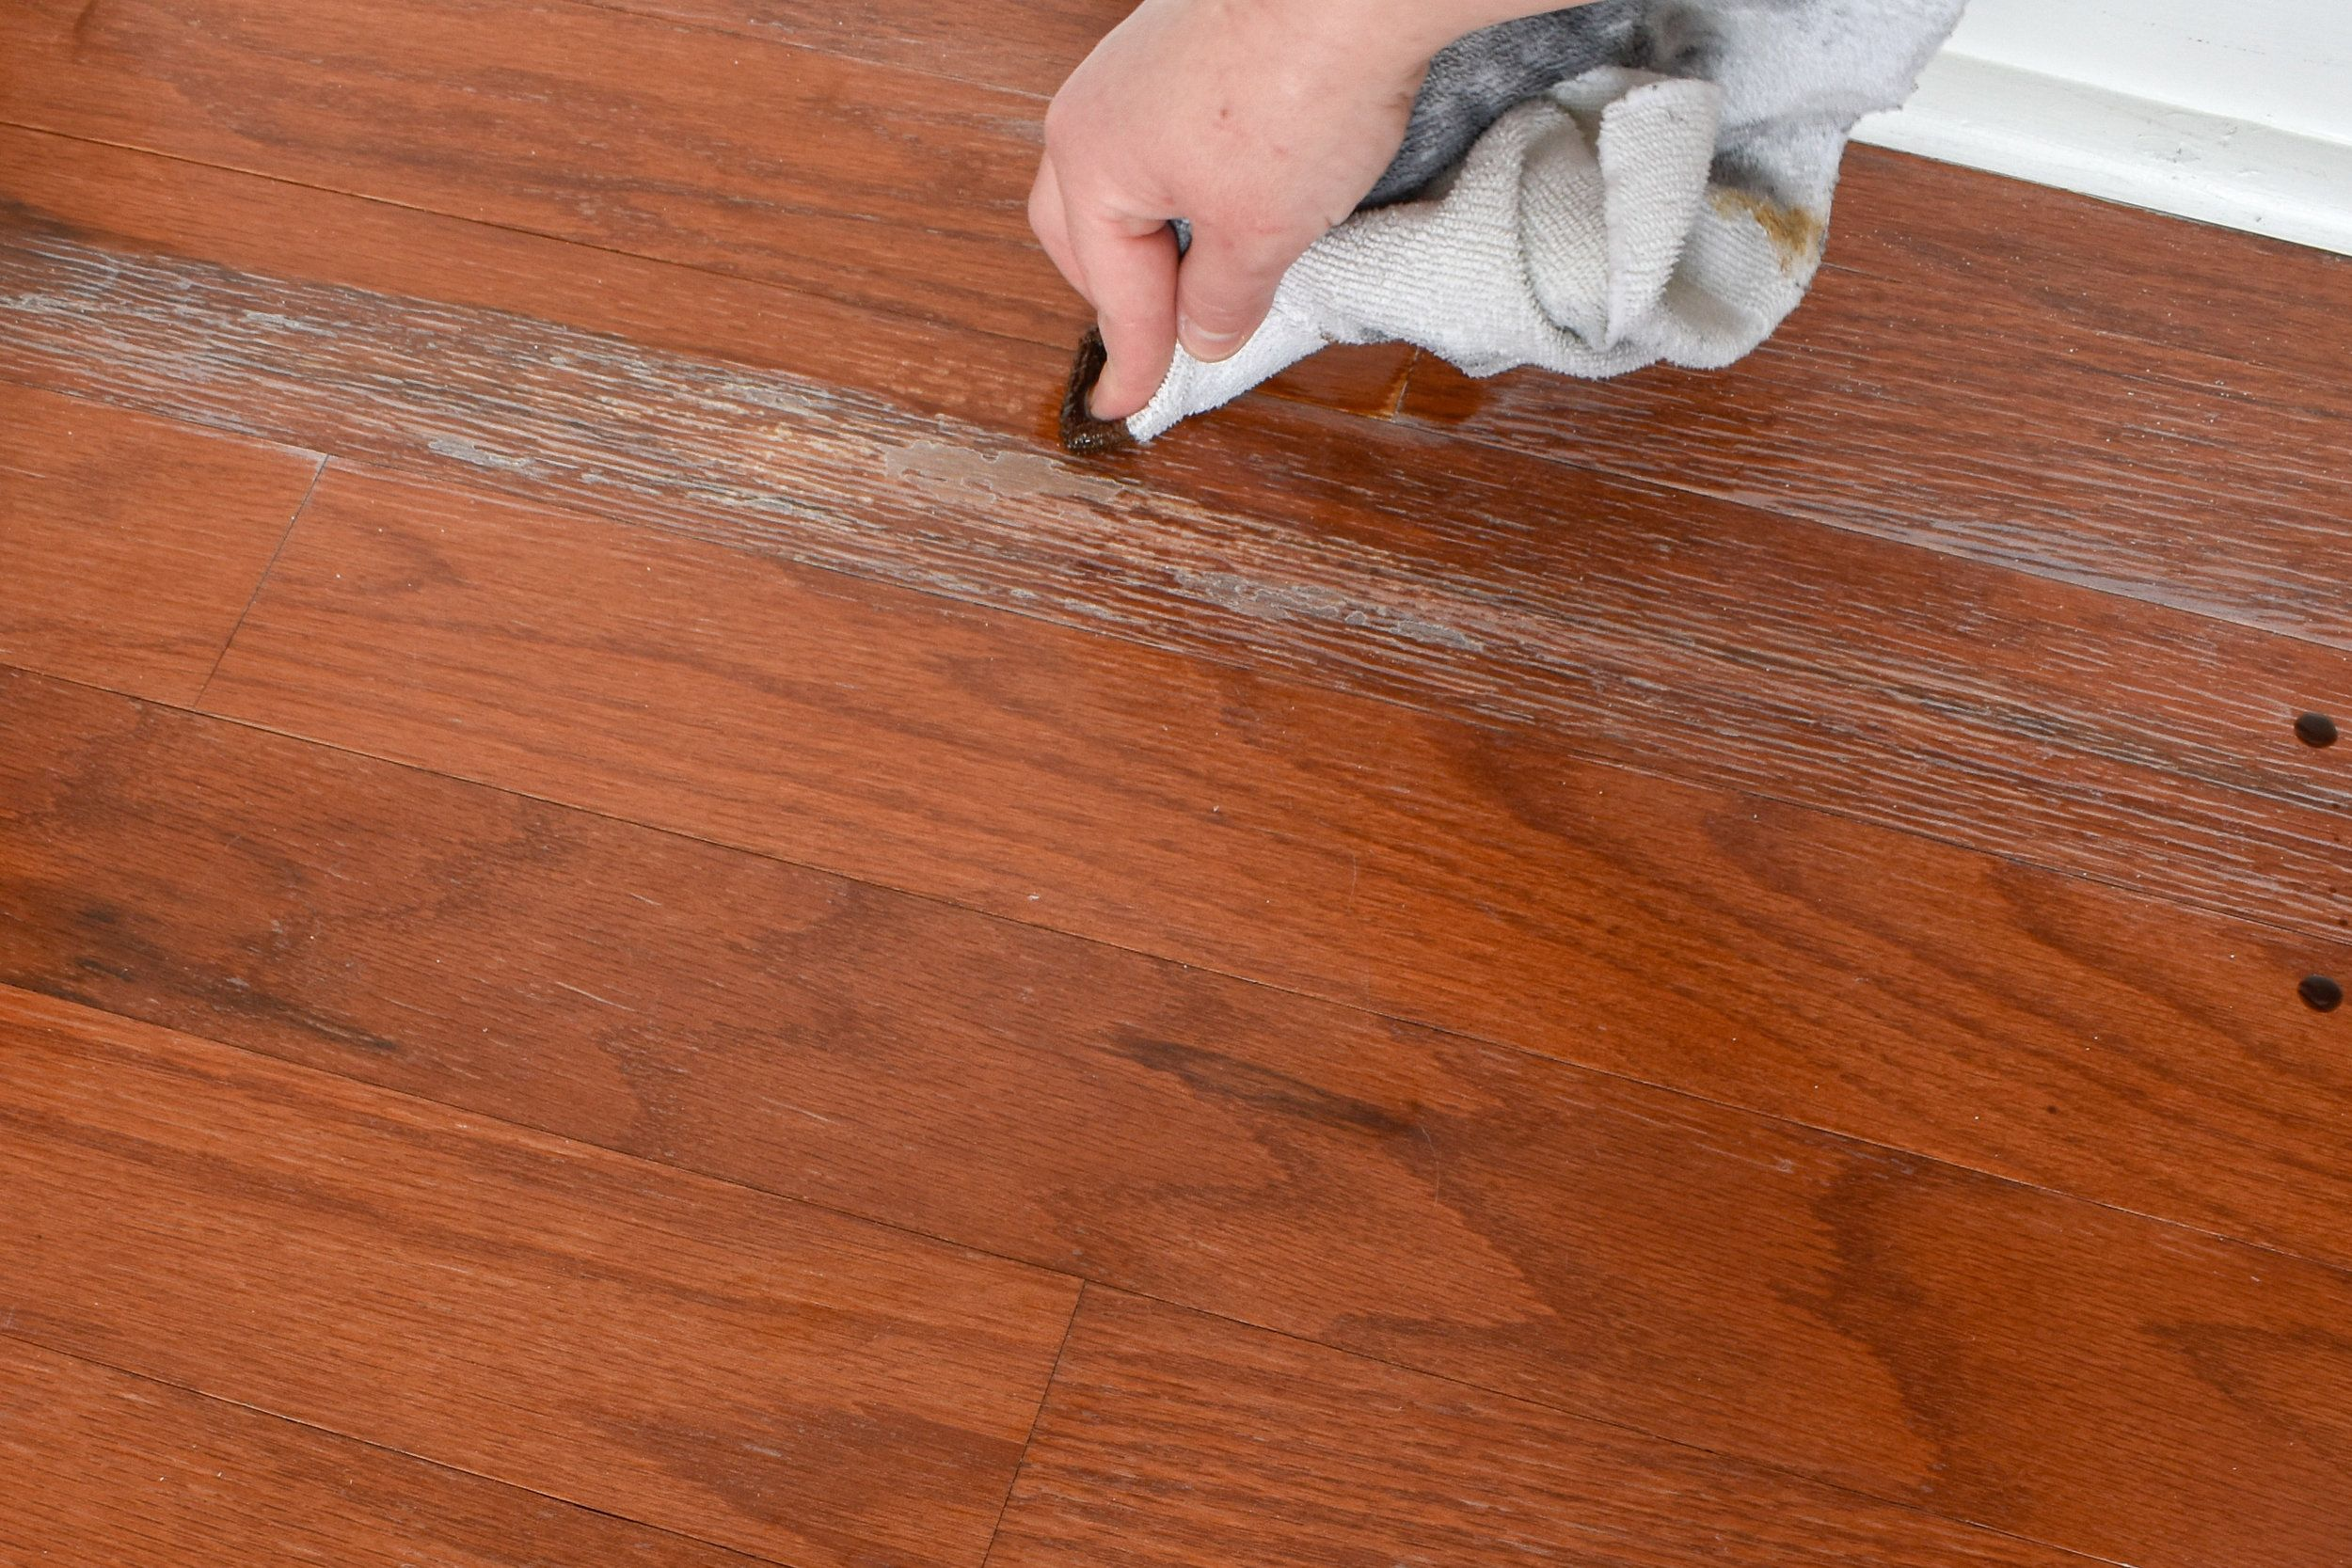 How To Make Old Hardwood Floors Shine